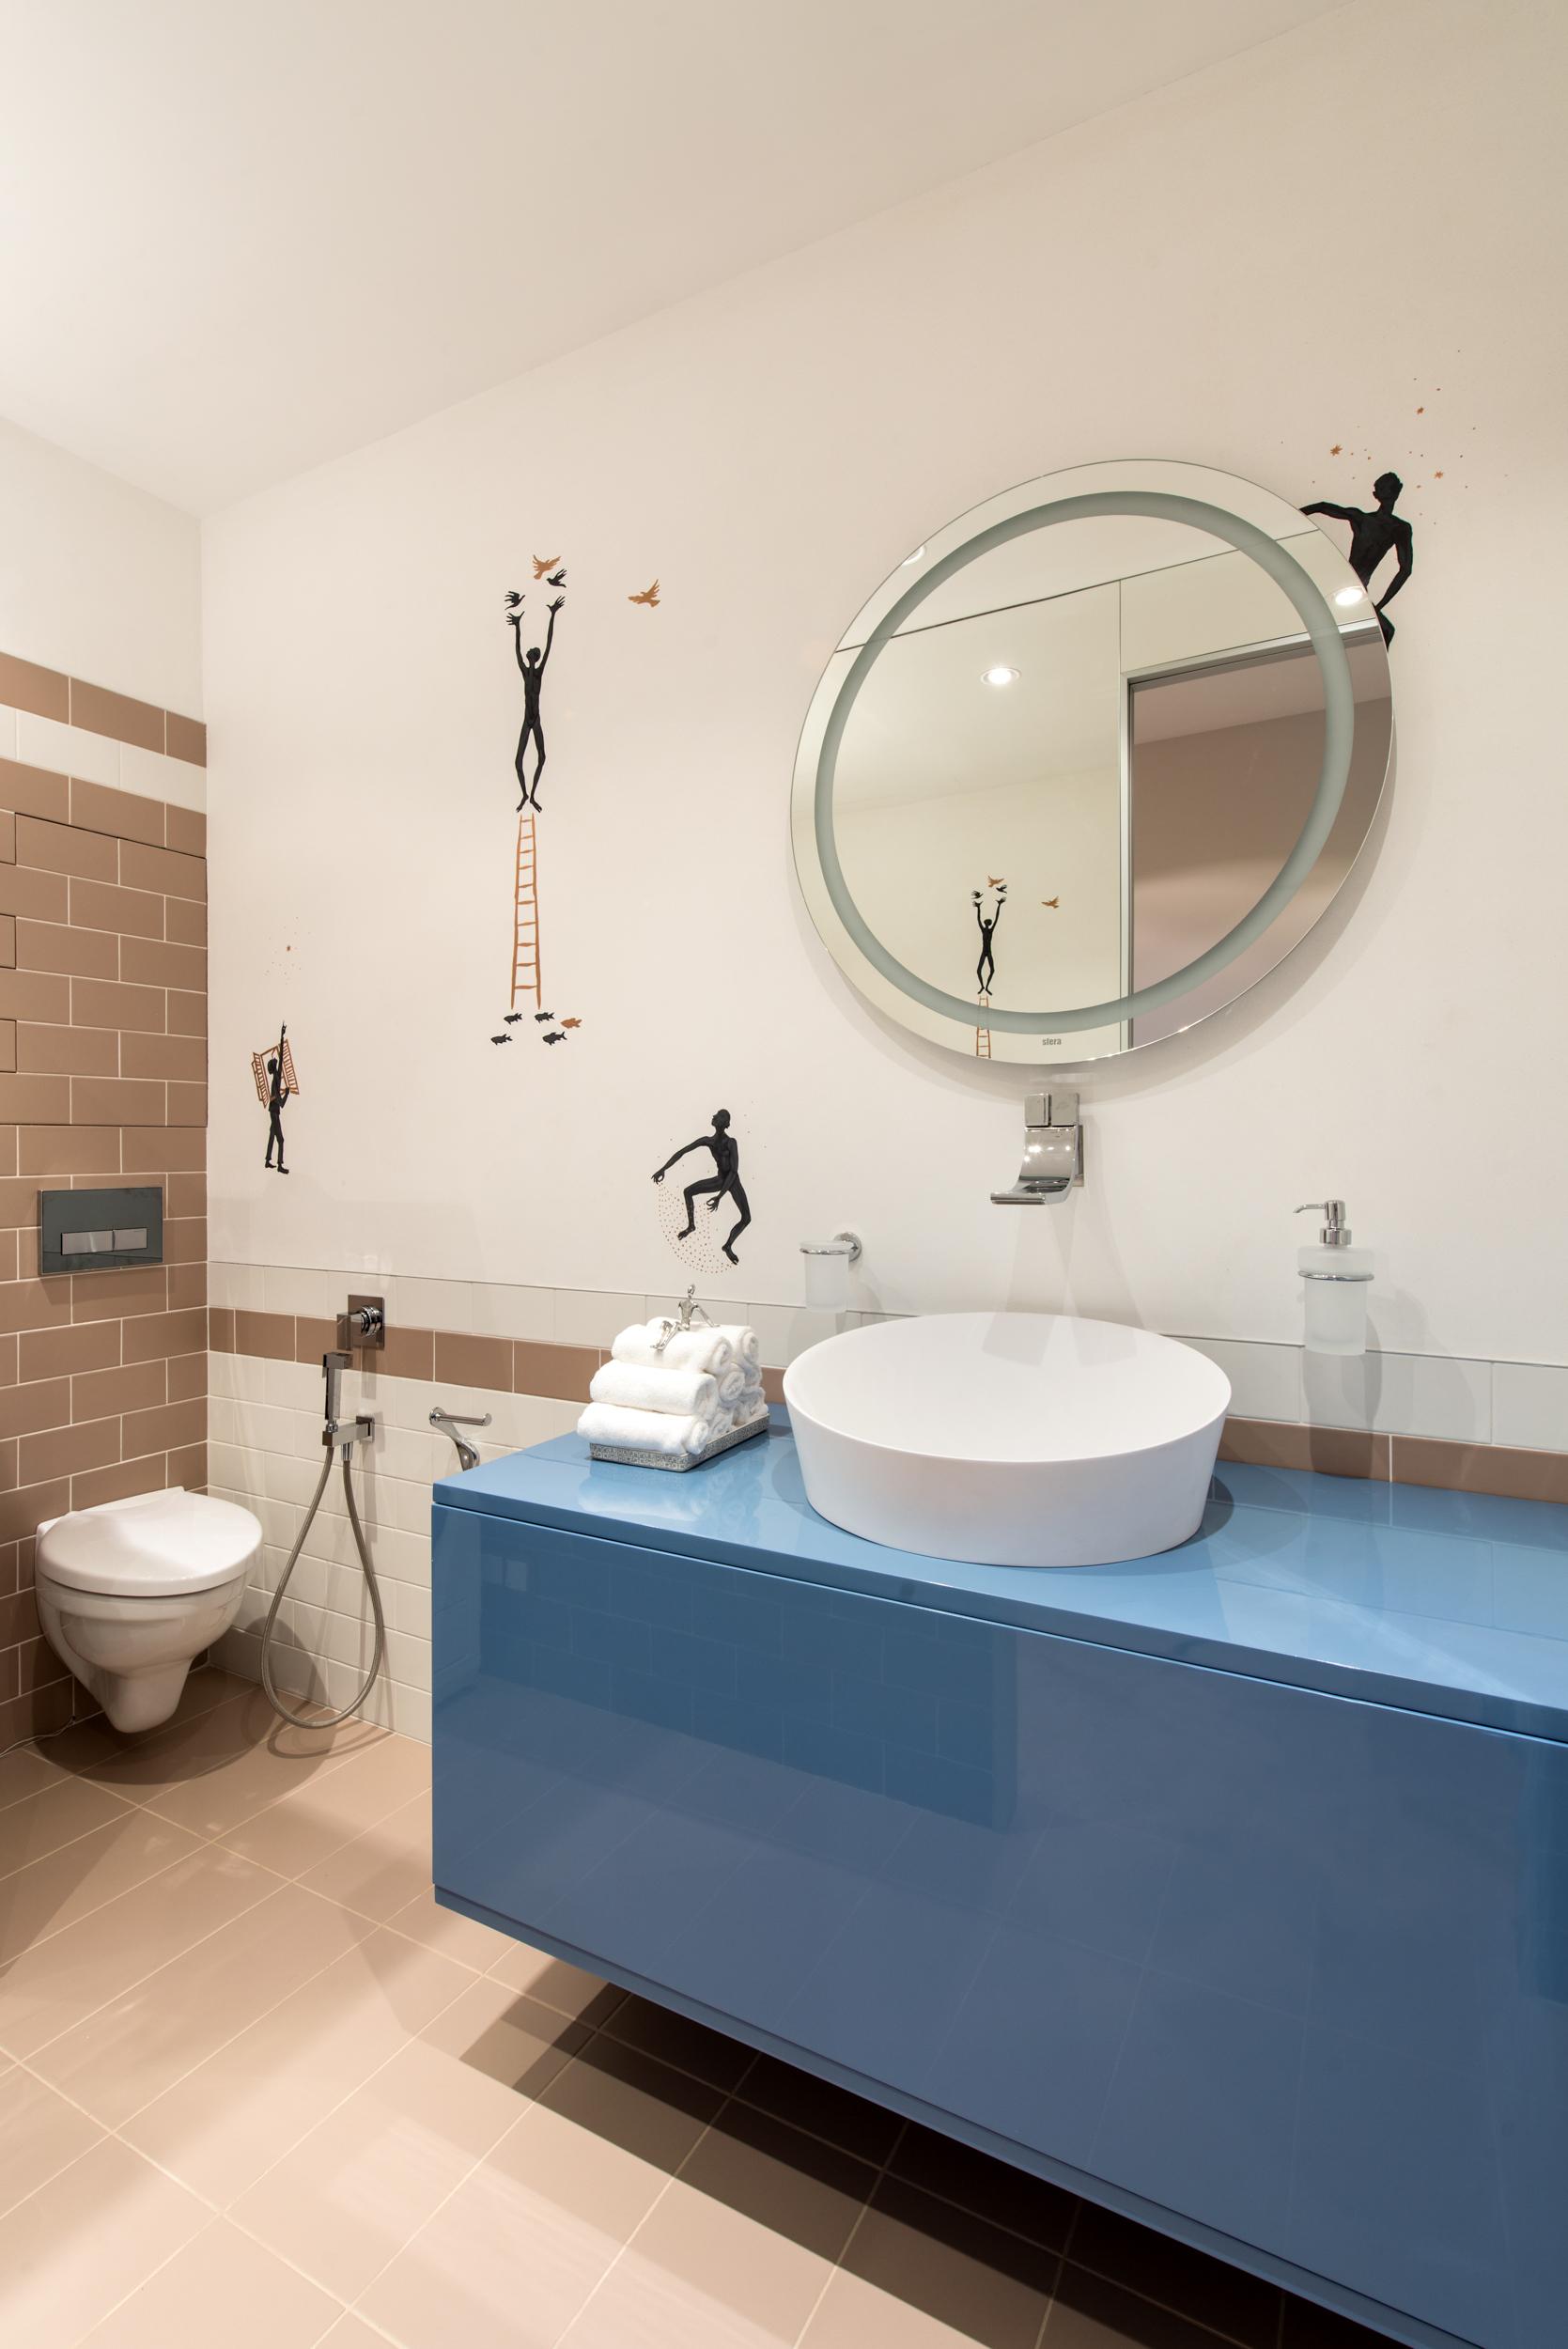 раковина, роспись,идея, ванная,тумба